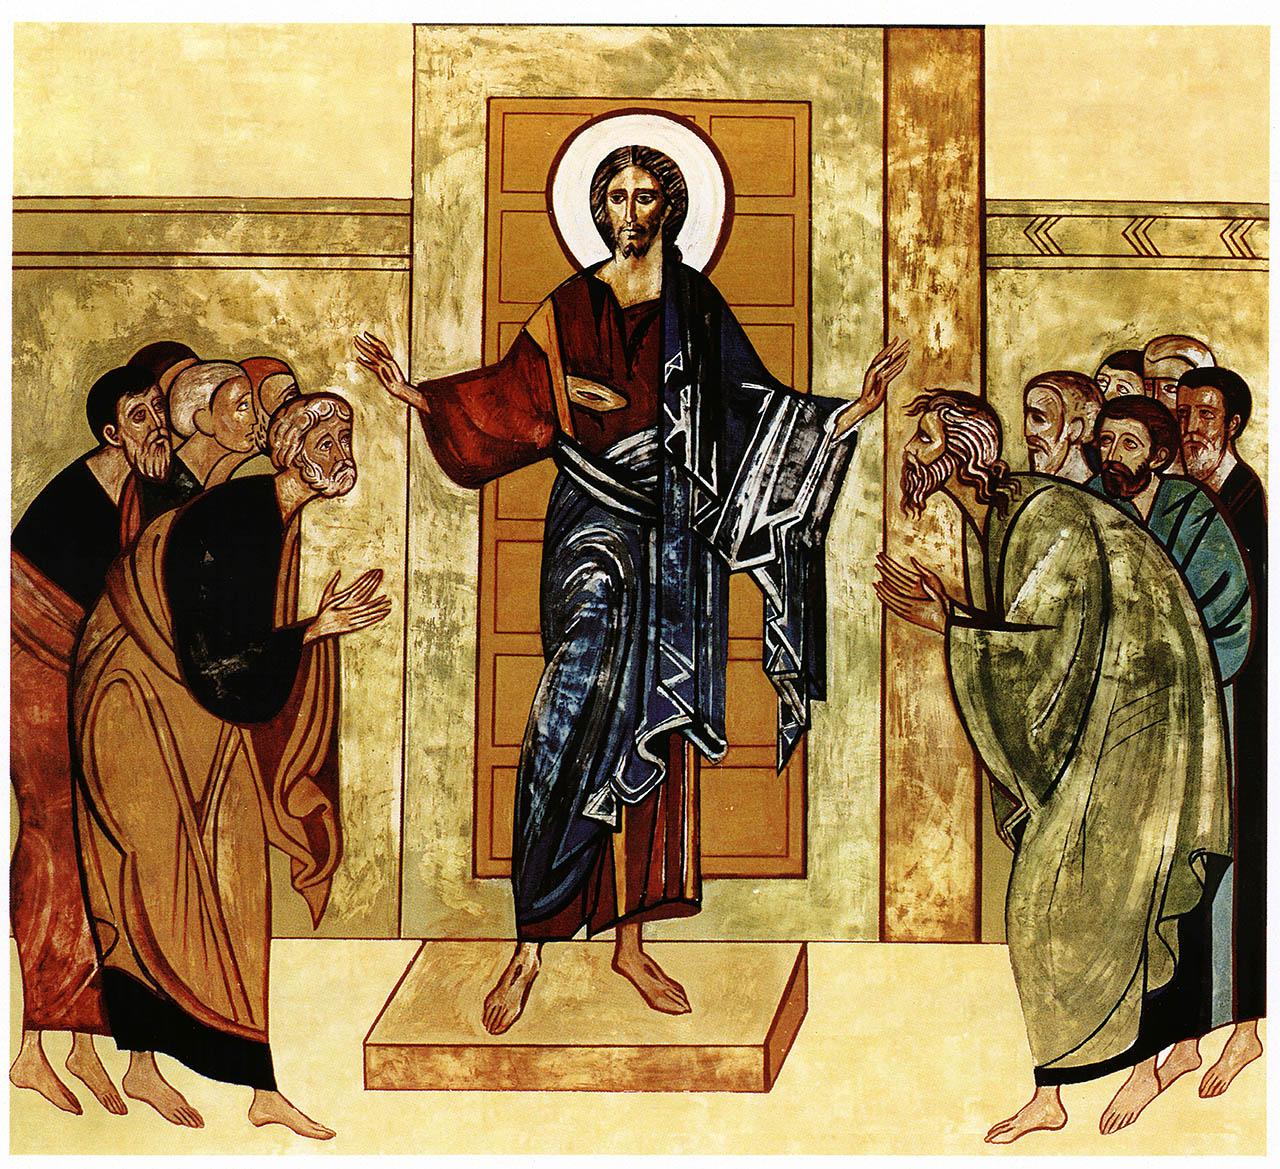 Vzkříšený Kristus